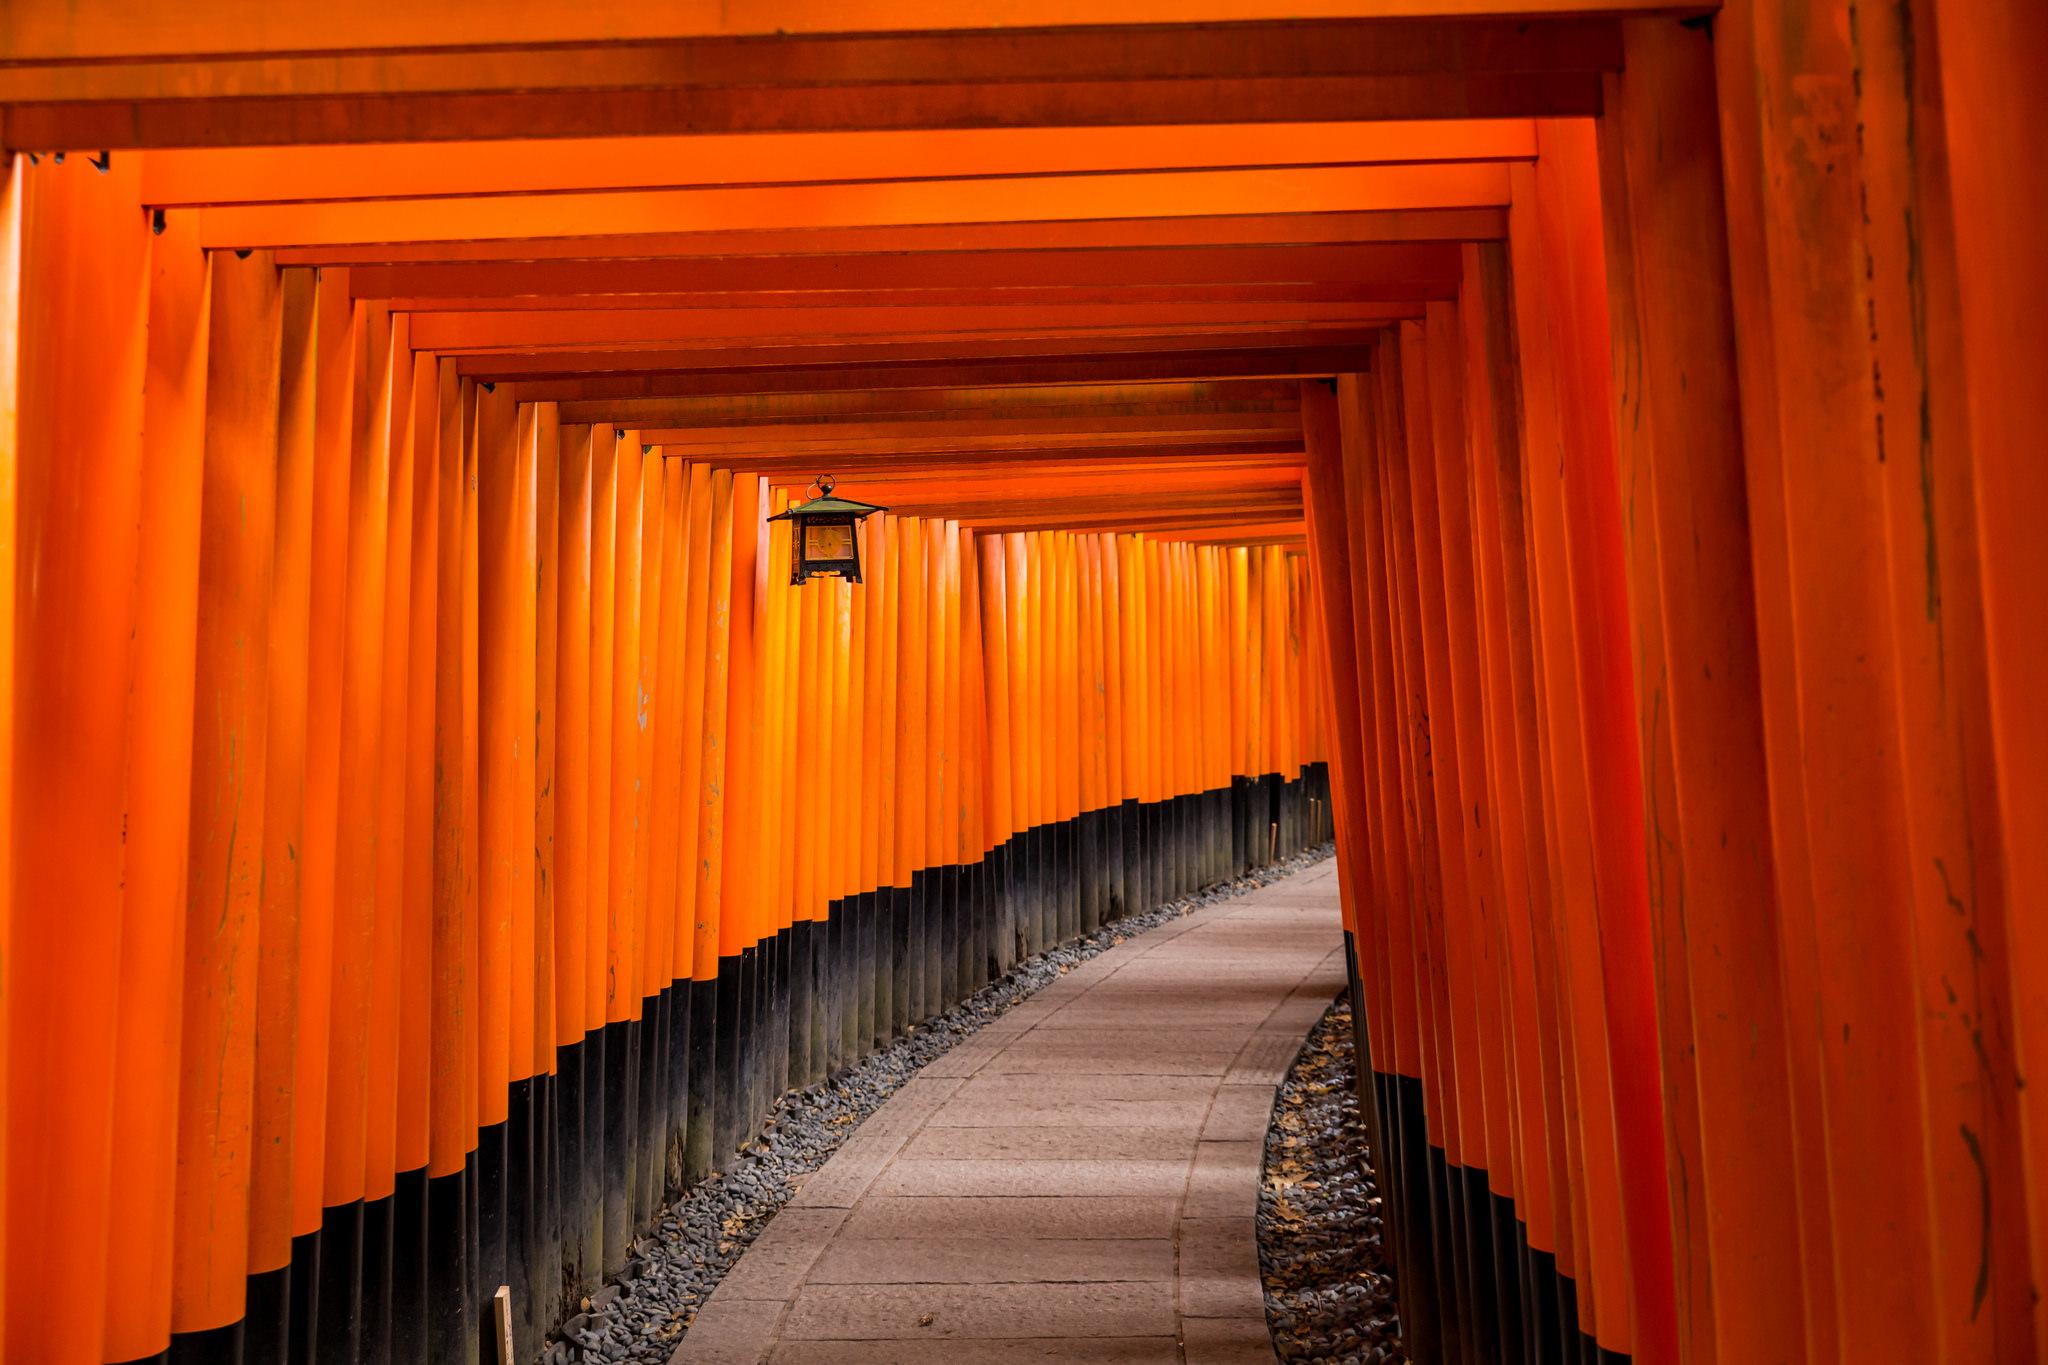 Fushimi Inari Shrine Kyoto, Japan